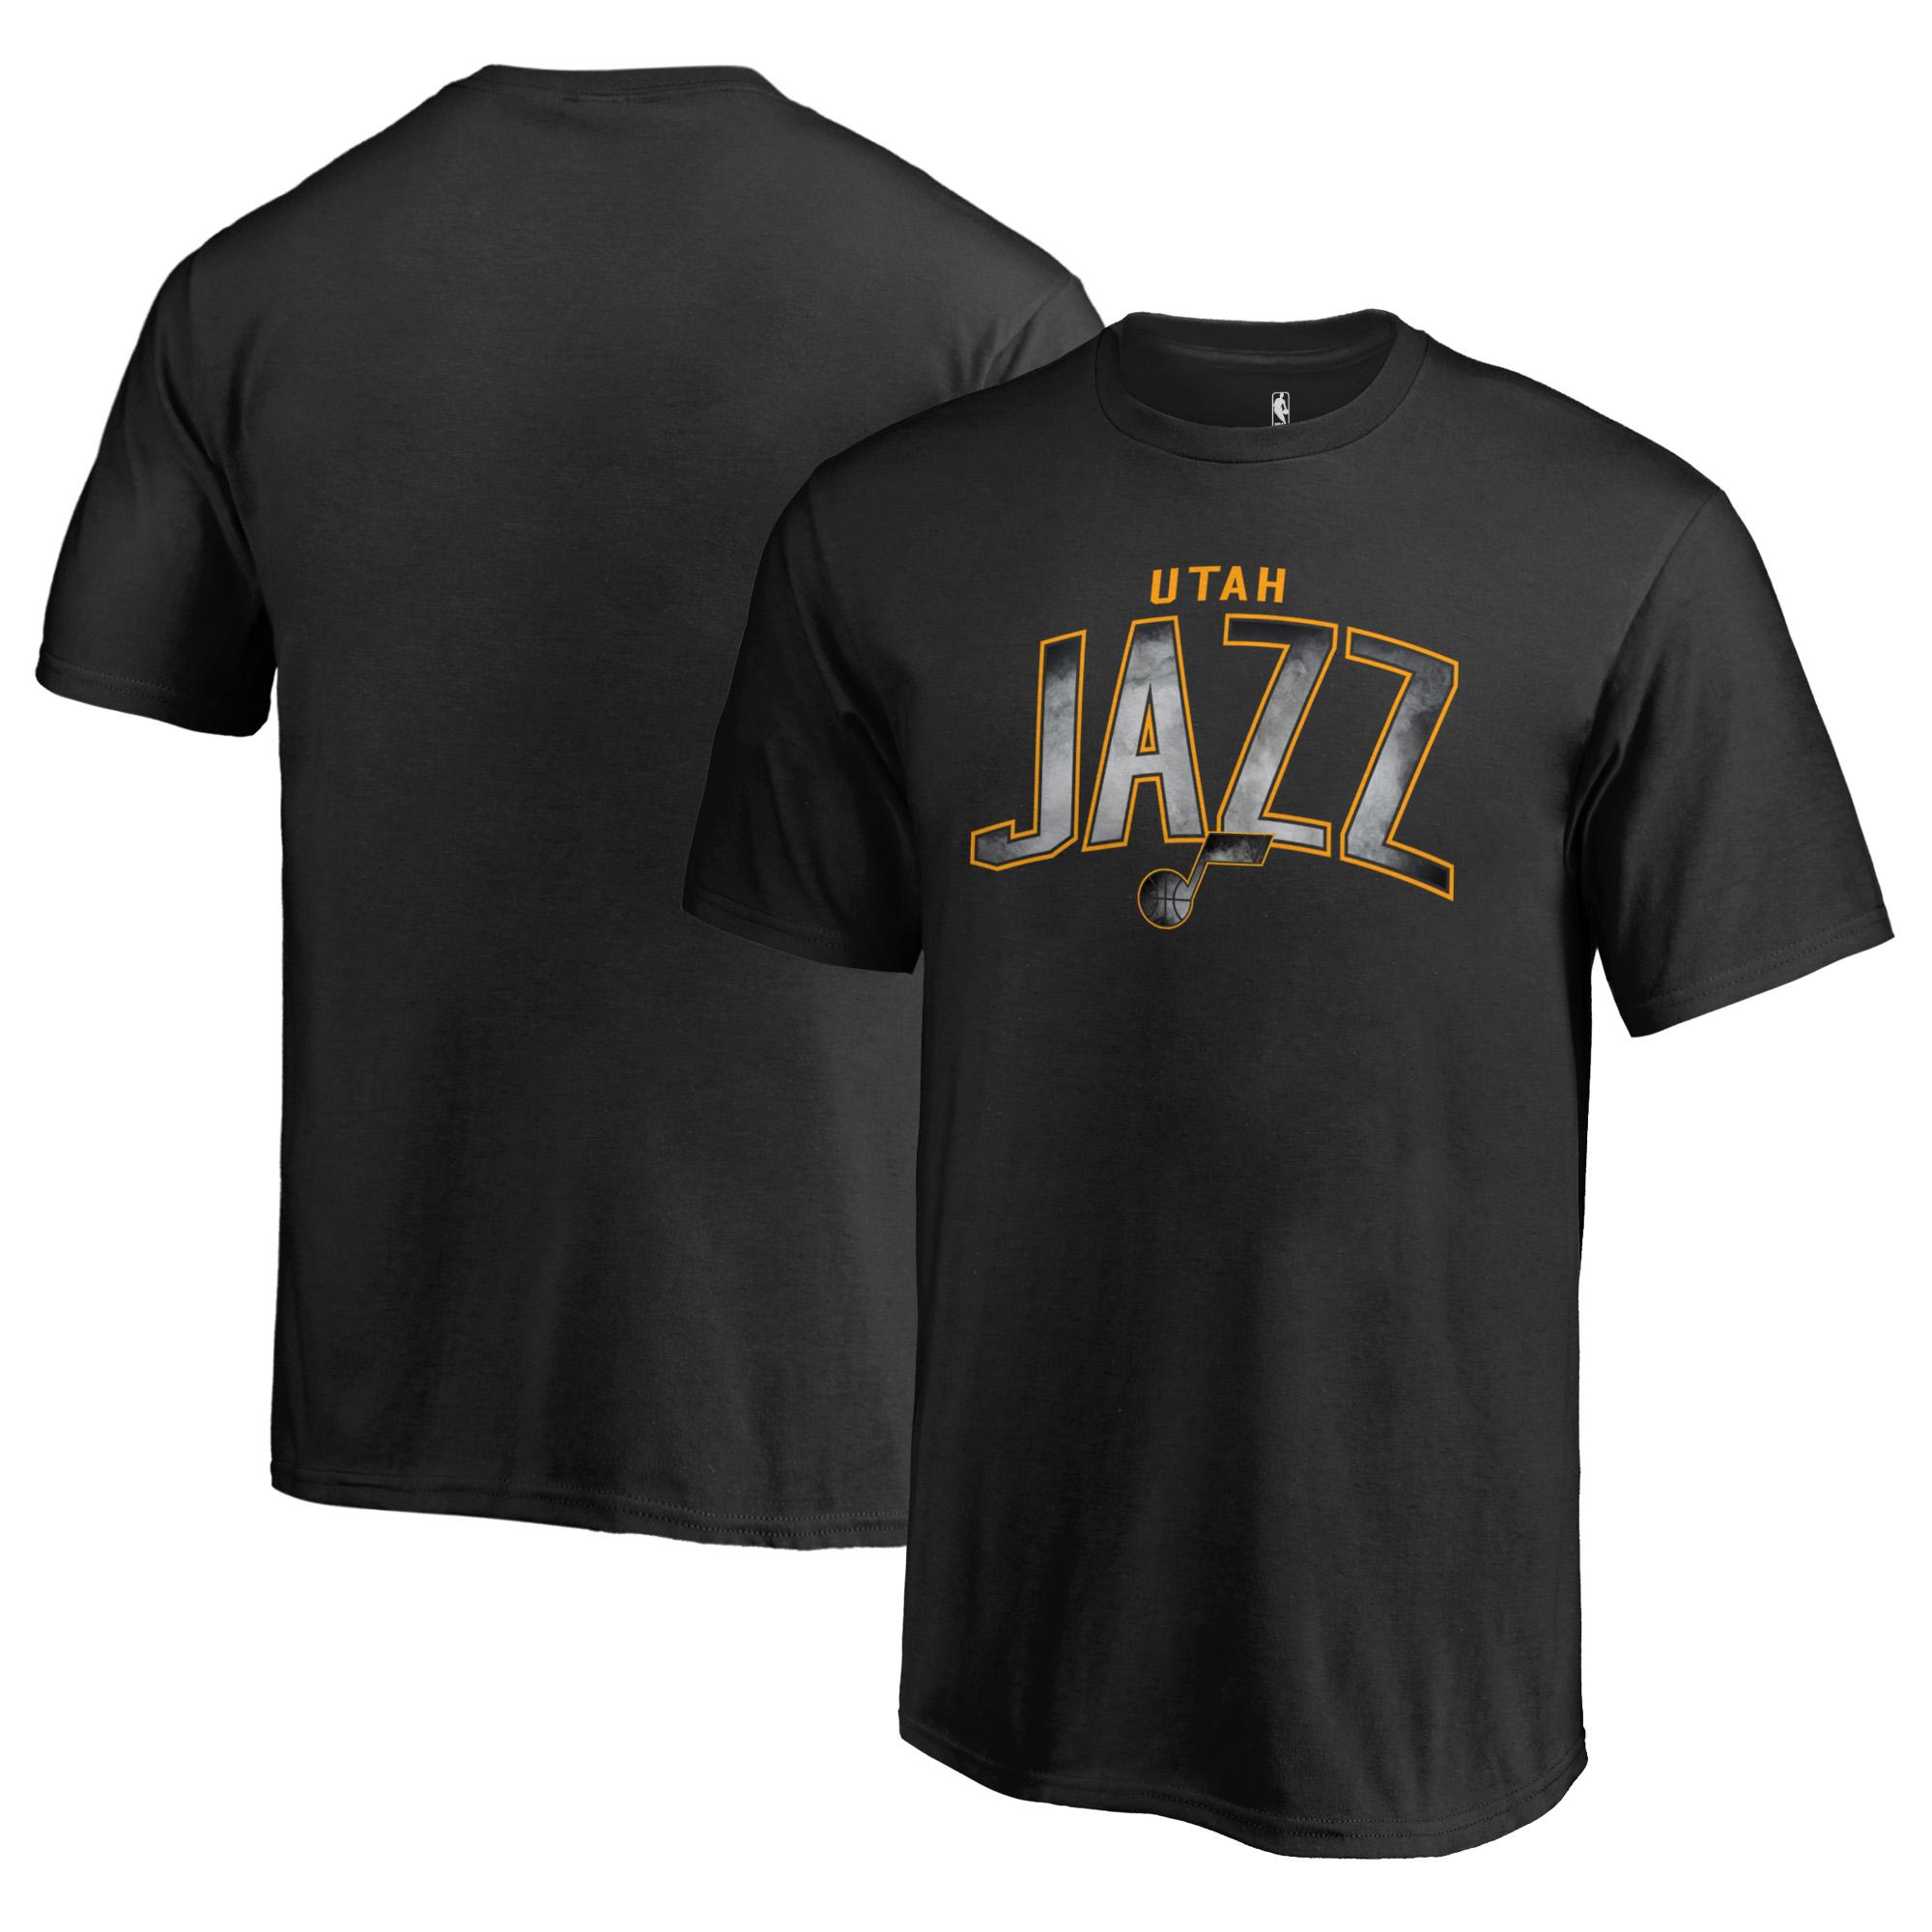 Utah Jazz Fanatics Branded Youth Arch Smoke T-Shirt - Black